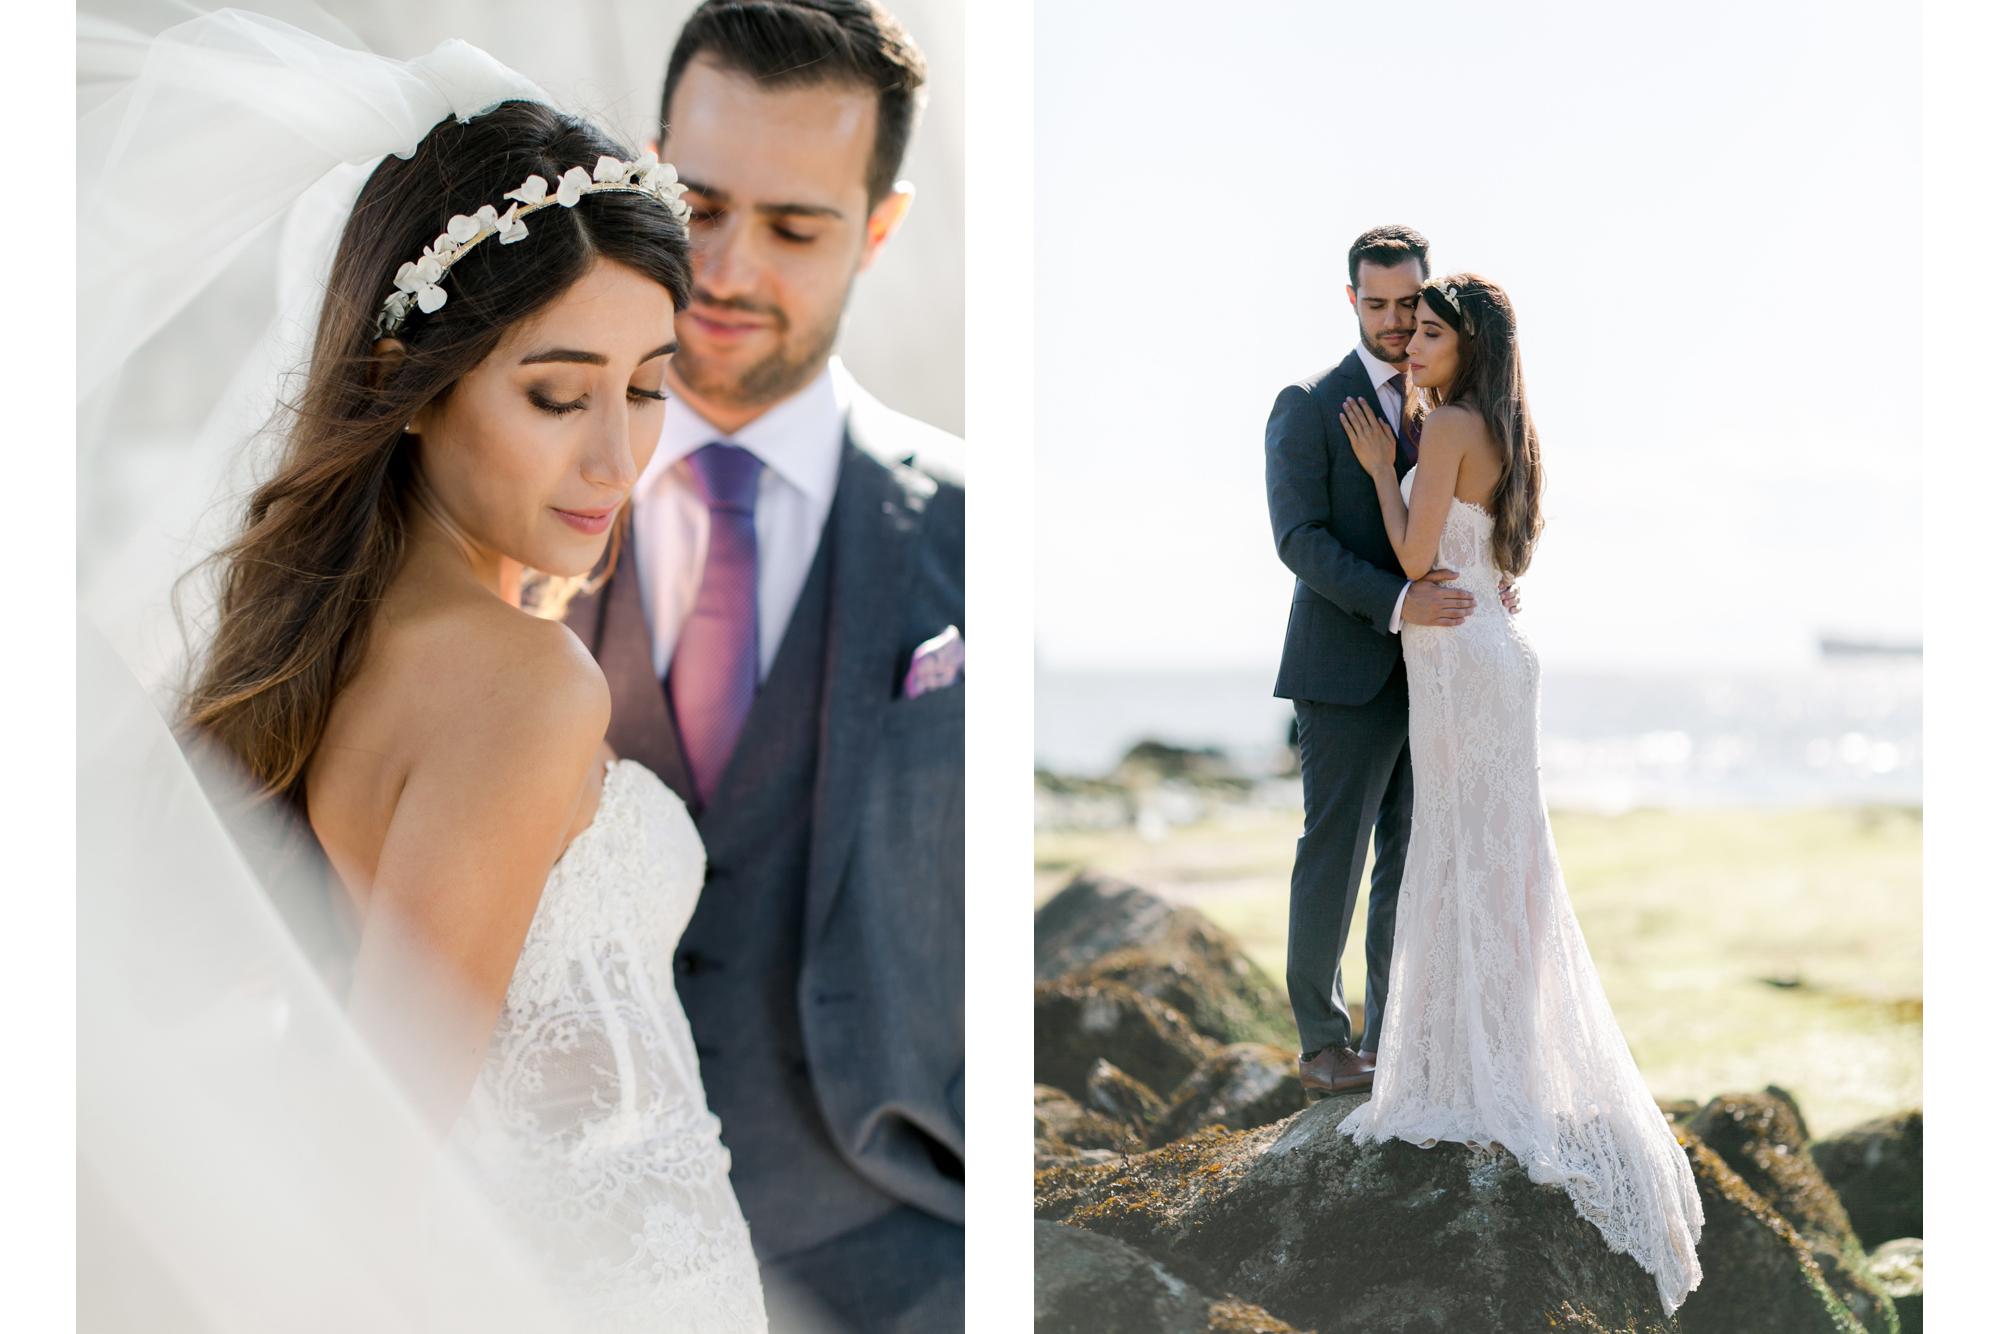 vancouver-luxury-wedding-photographer-lori-miles-33.jpg